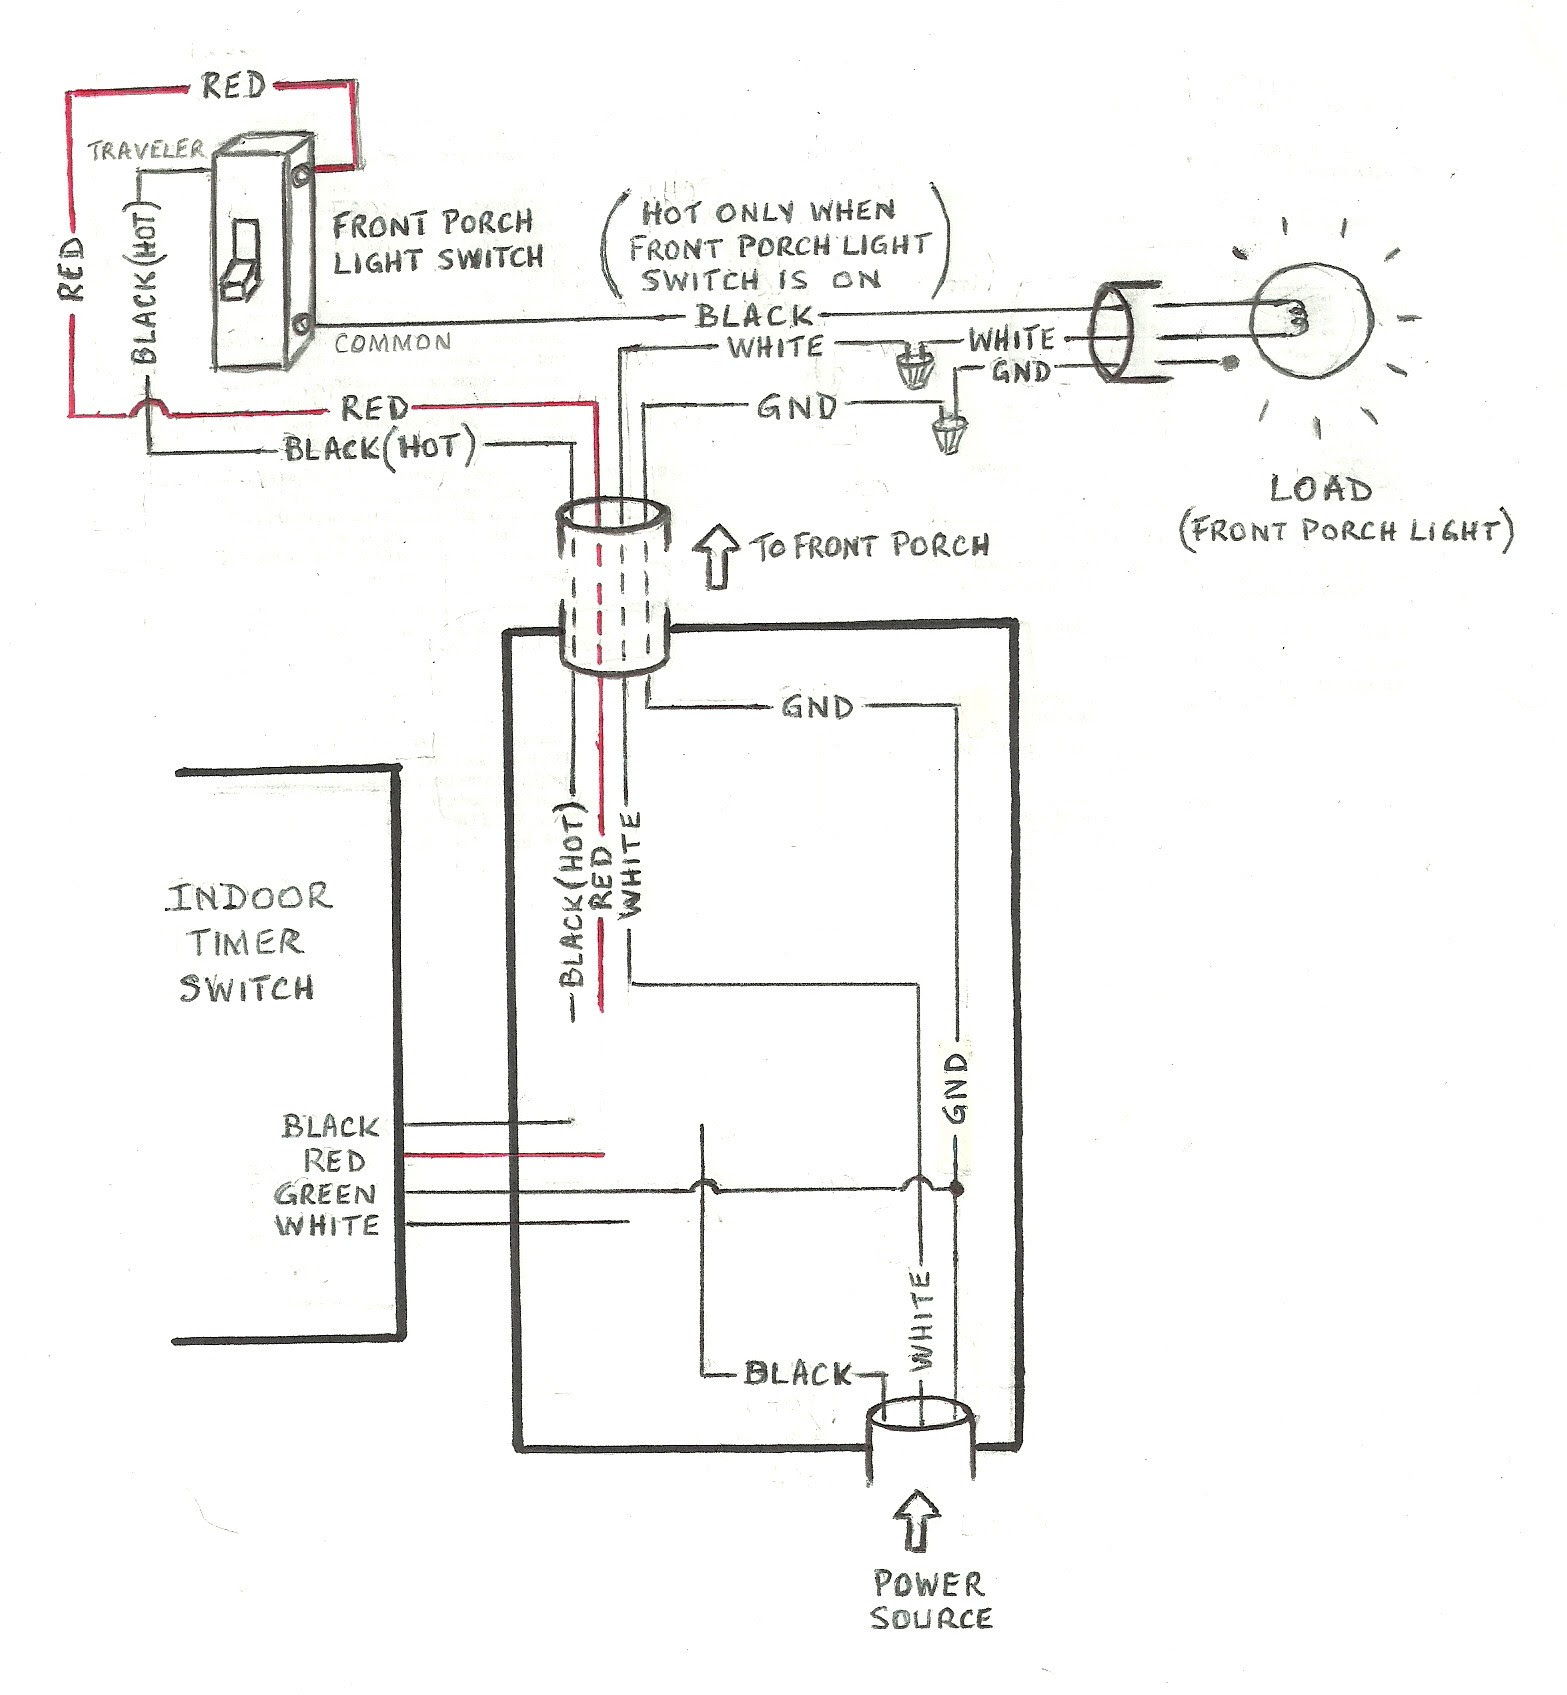 diagram] 2003 kinetic moped wiring diagram full version hd quality wiring  diagram - lumi-diagram.radd.fr  radd